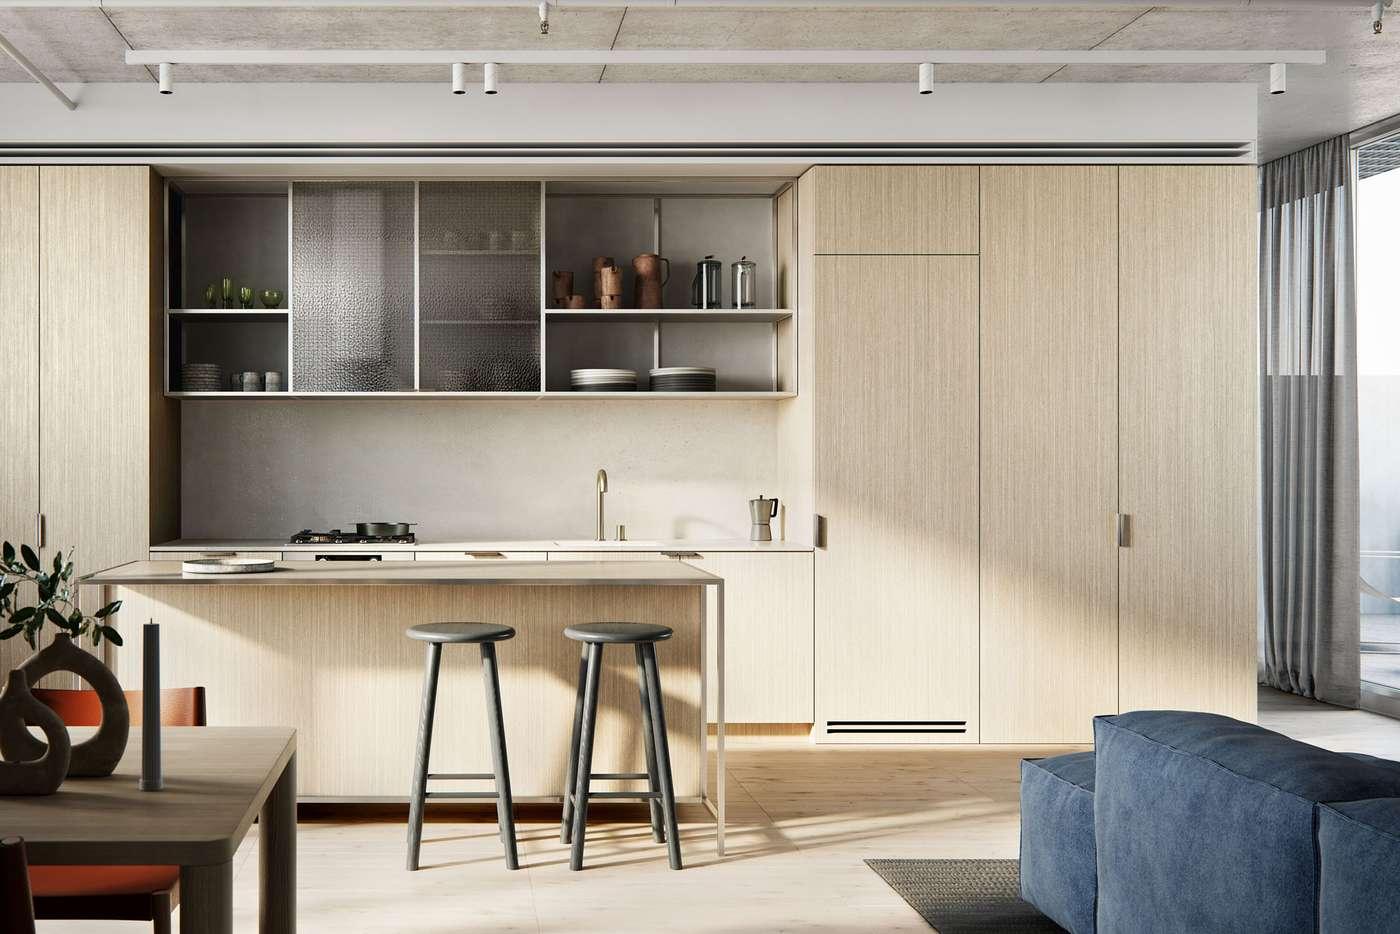 Main view of Homely apartment listing, 117/8 Ballarat Street, Brunswick VIC 3056